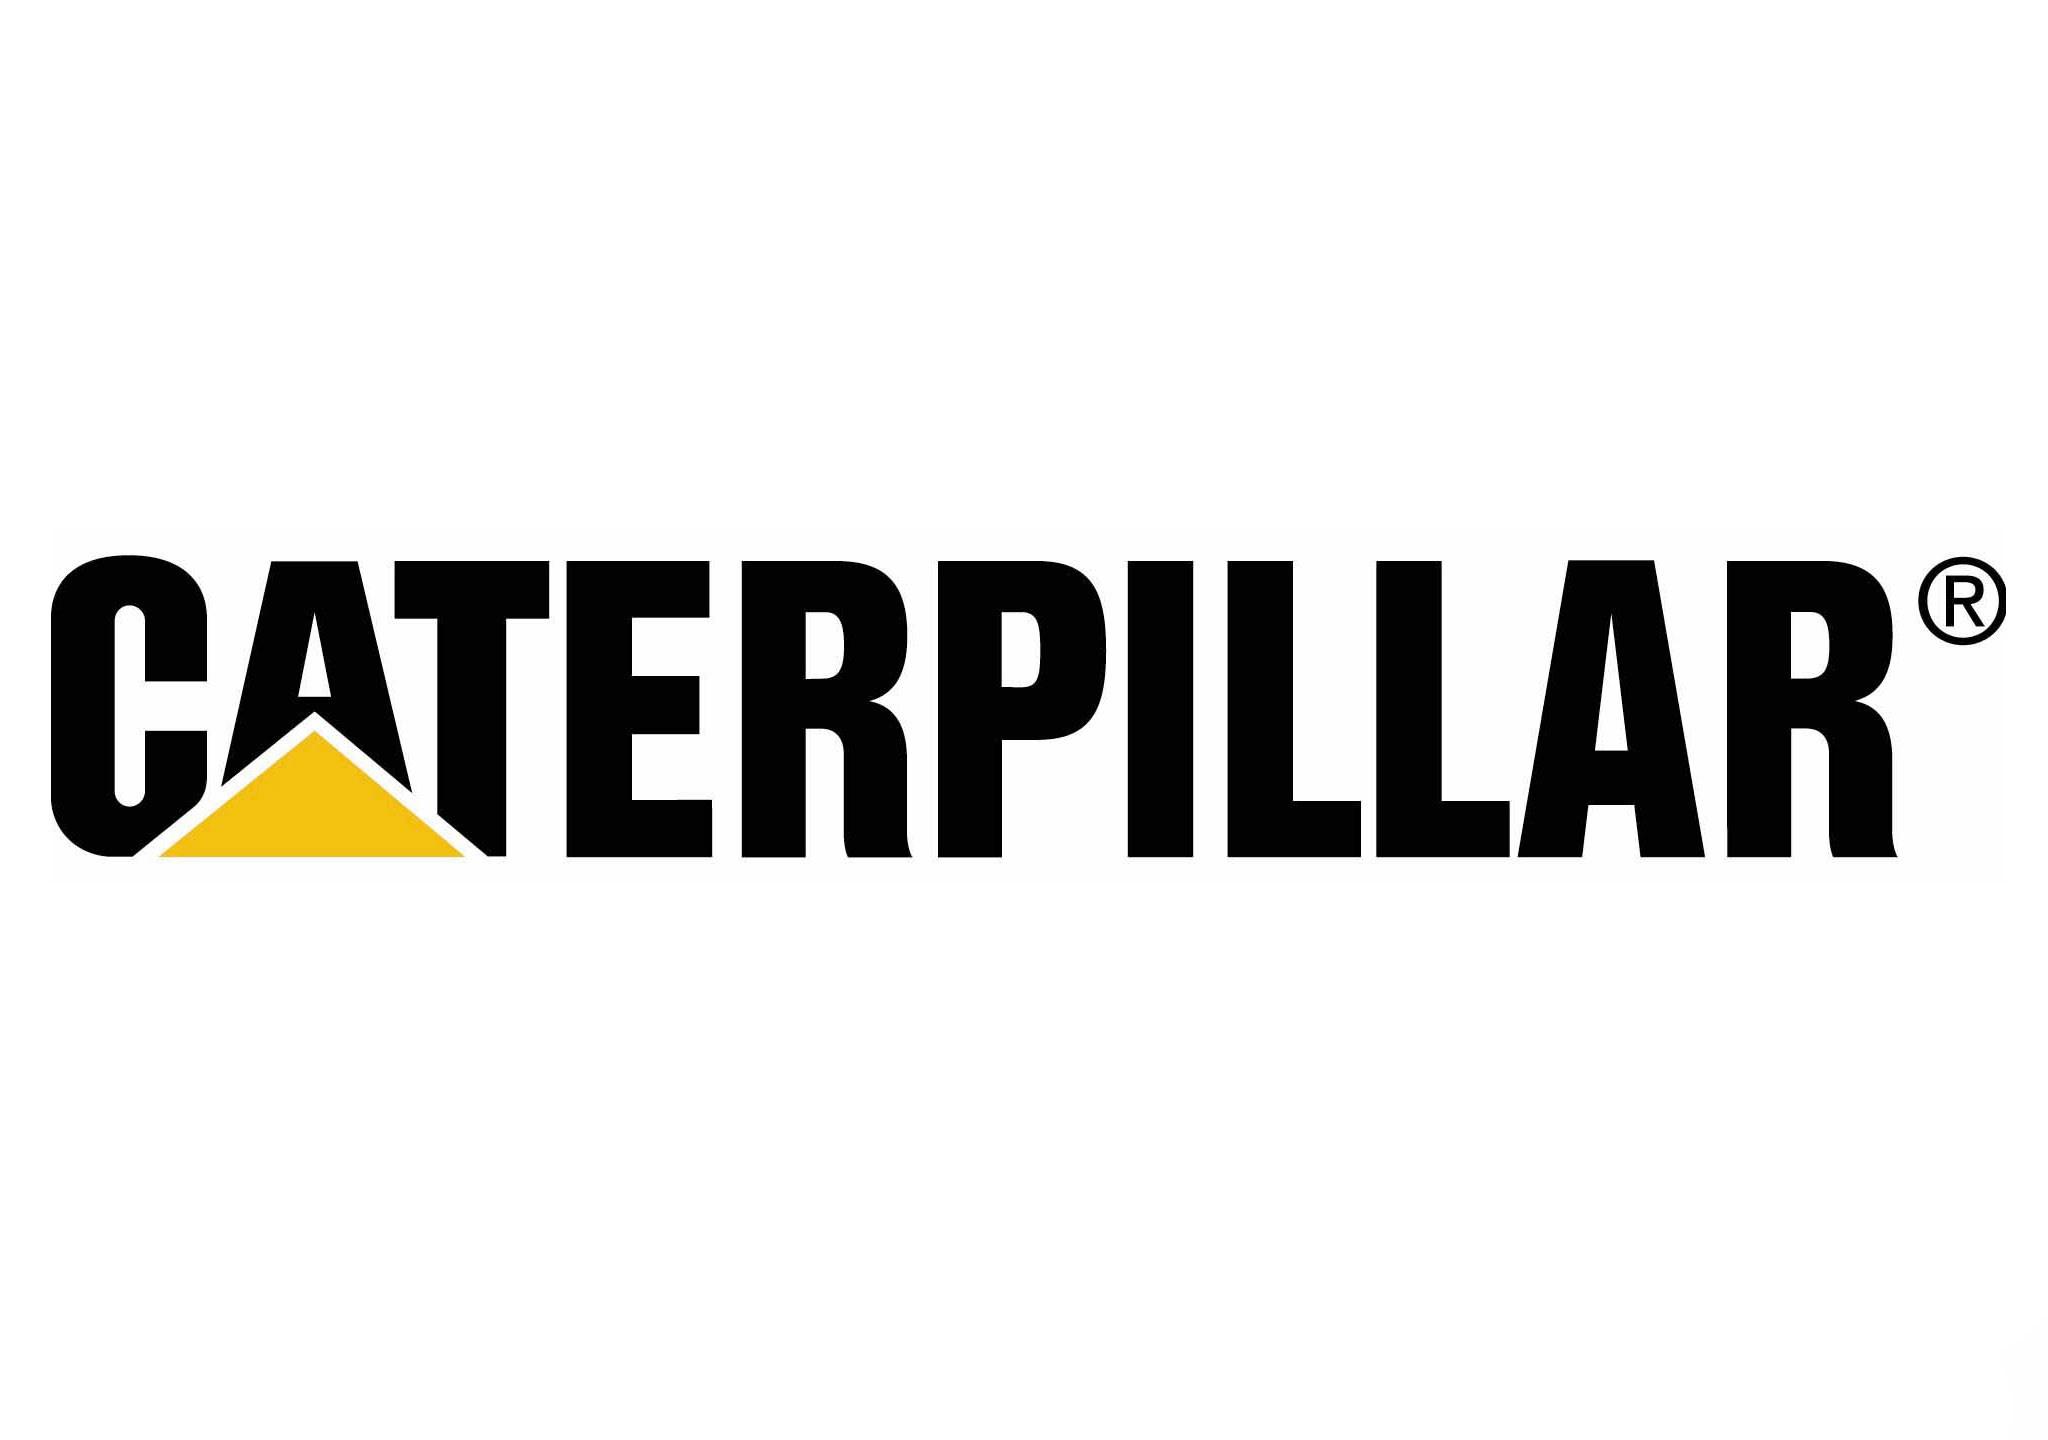 Caterpillar logo_1444171946570.jpg